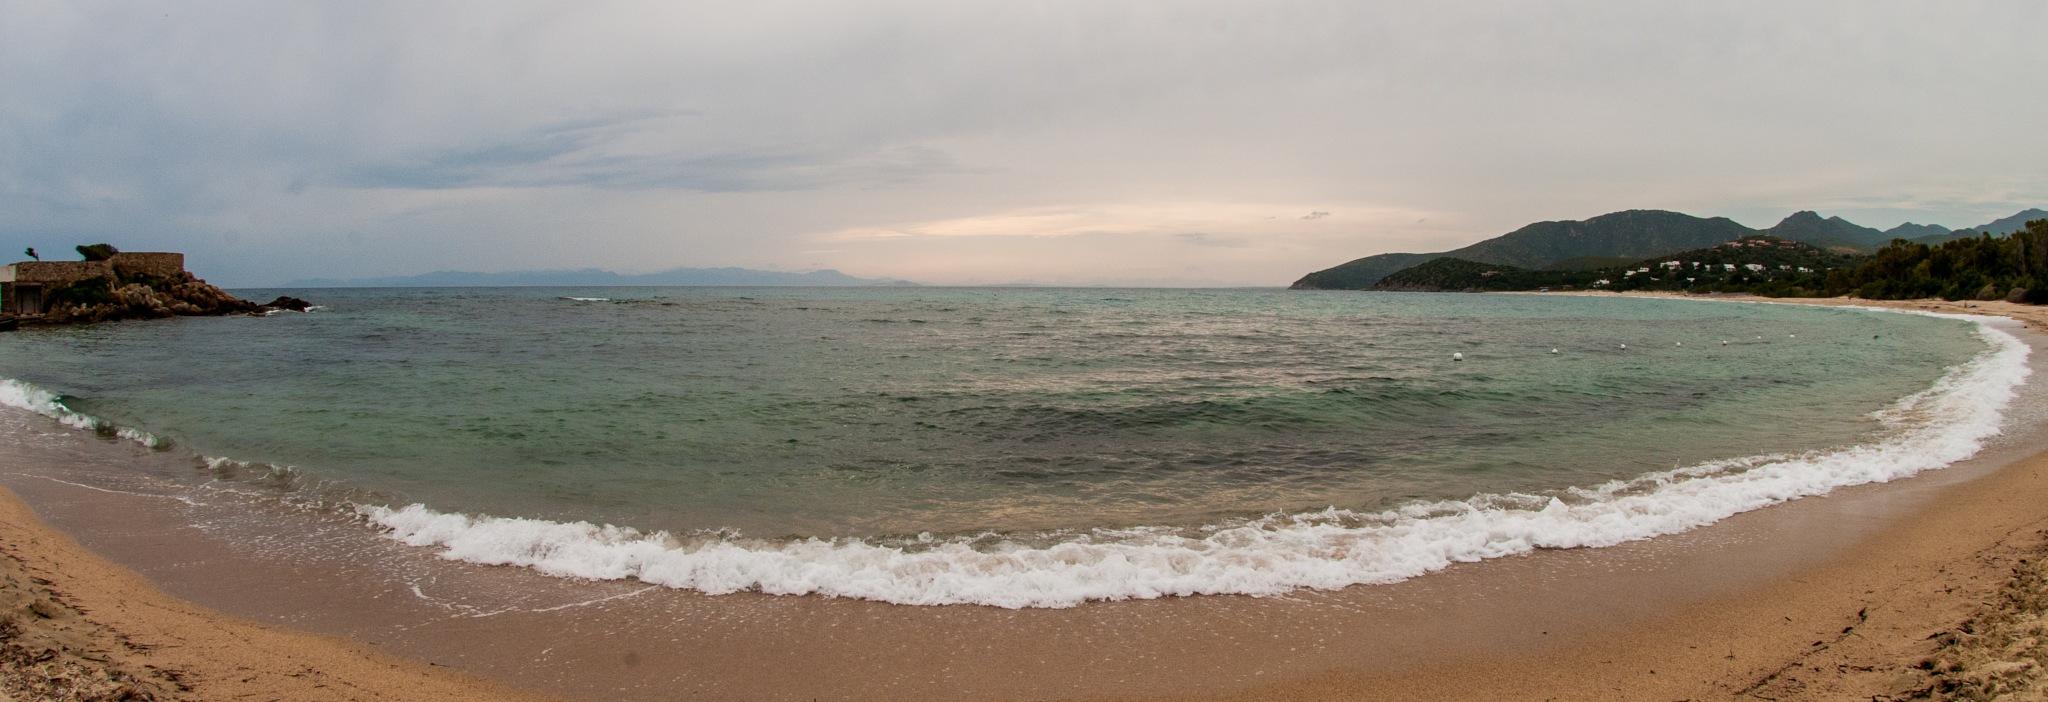 Spiaggia di Baccu Mandara (Maracalagonis/Sardegna) by corvonero